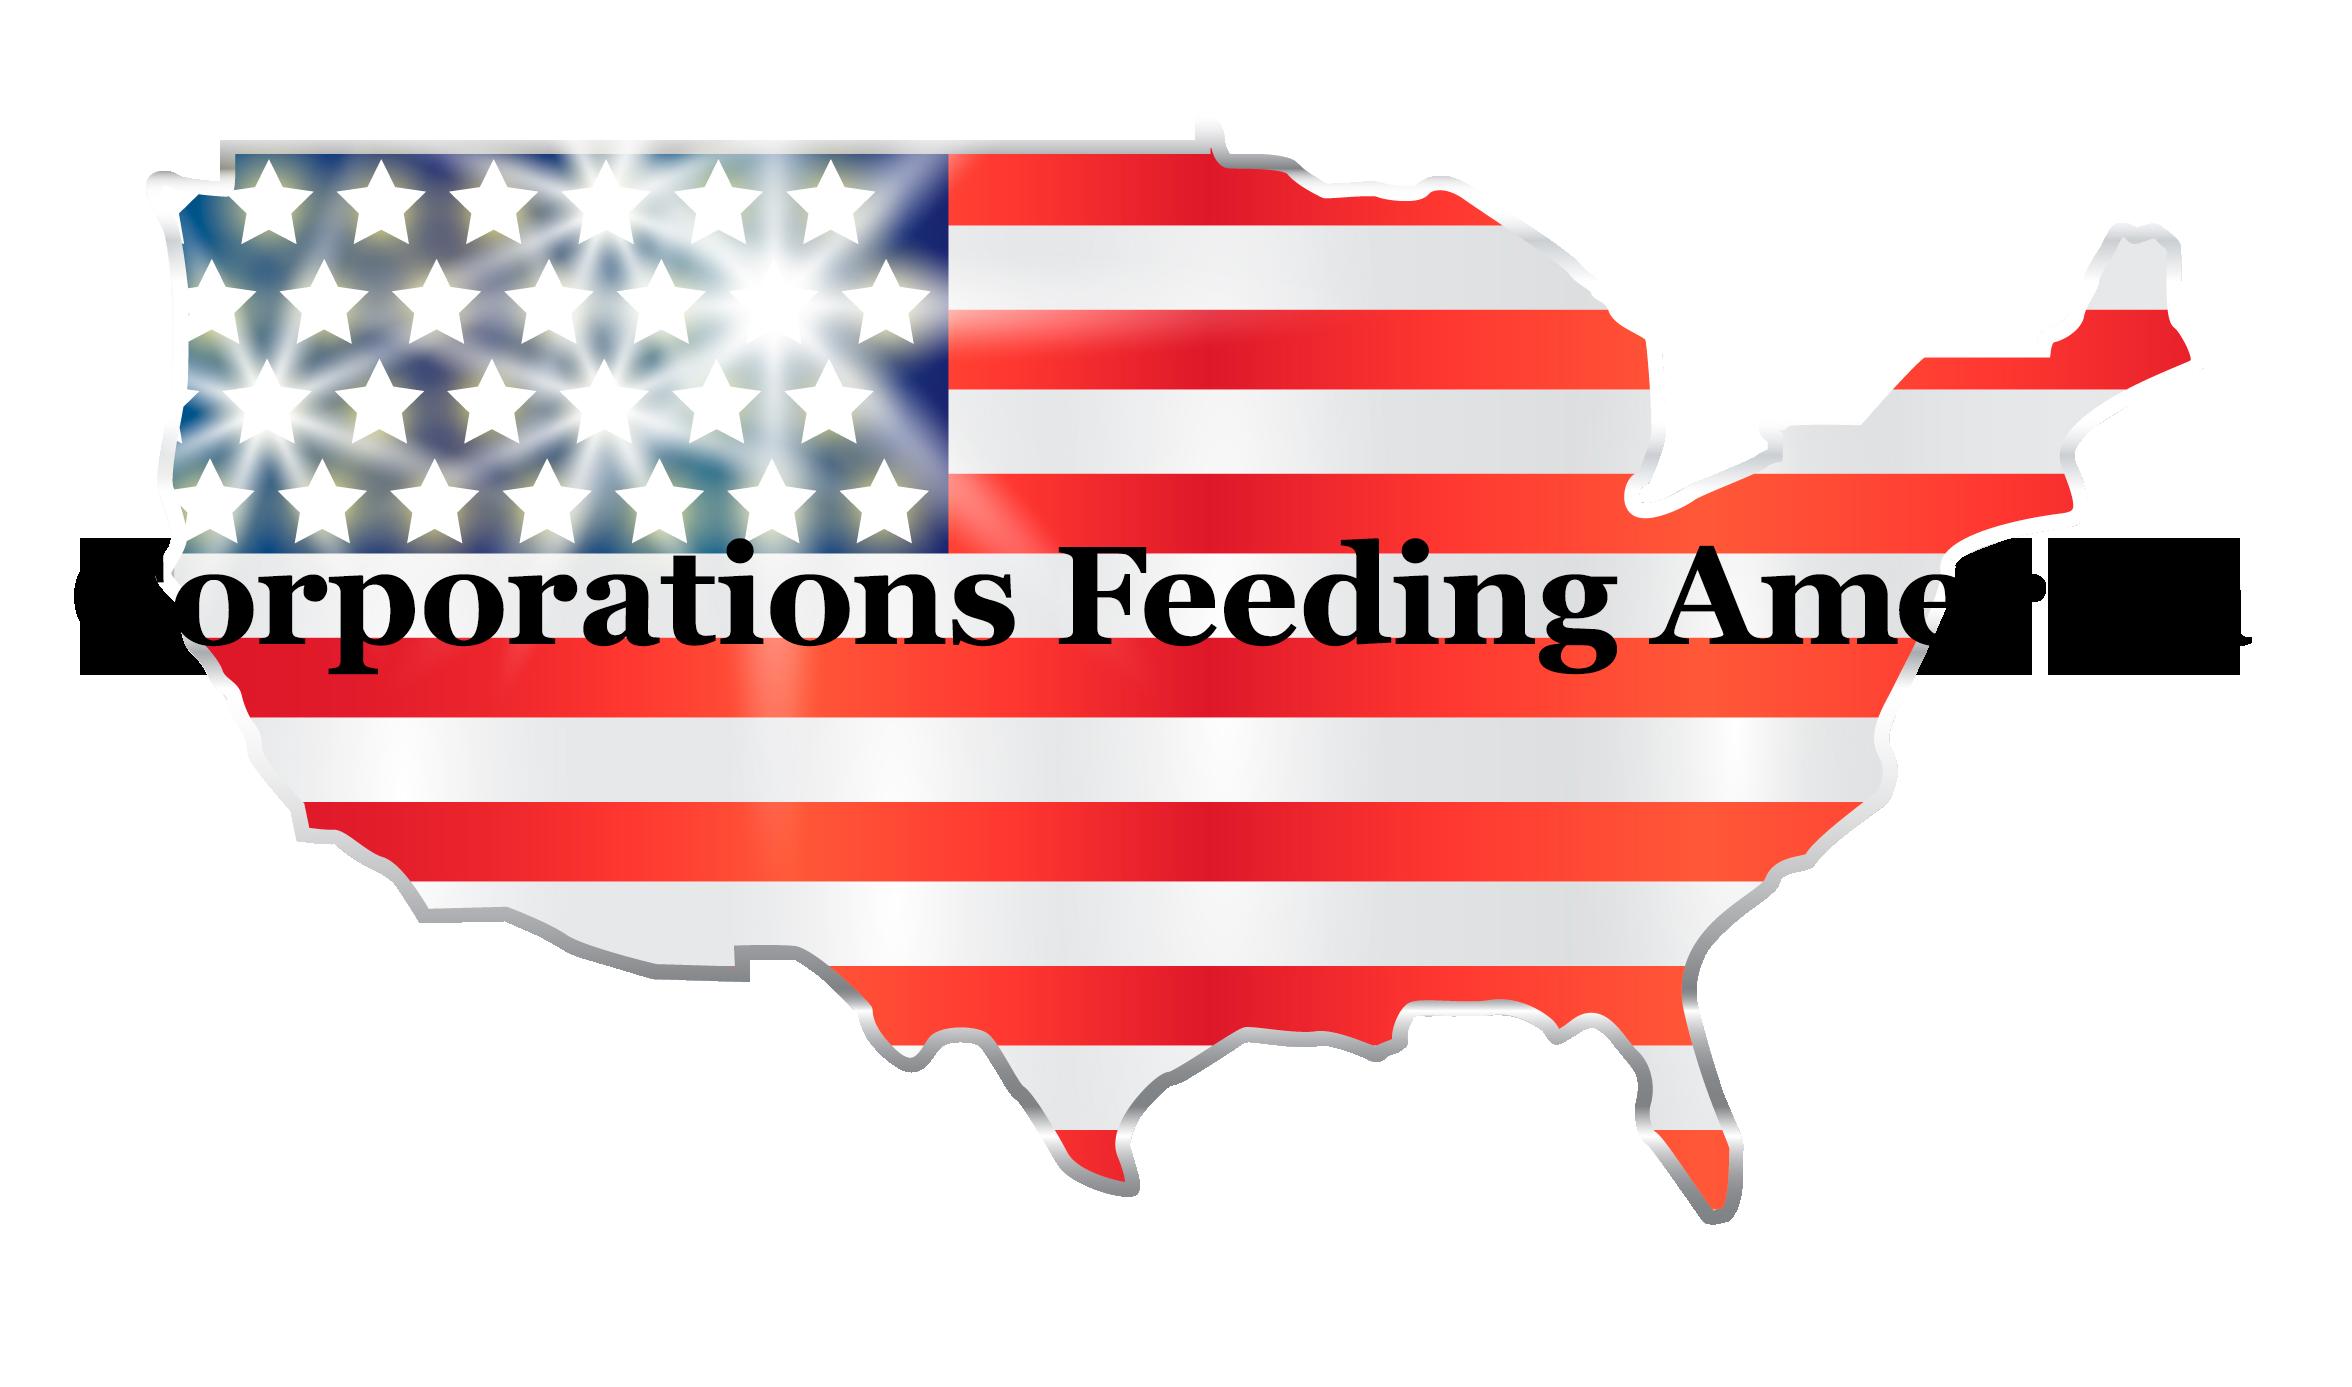 Corporations Feeding America 2018